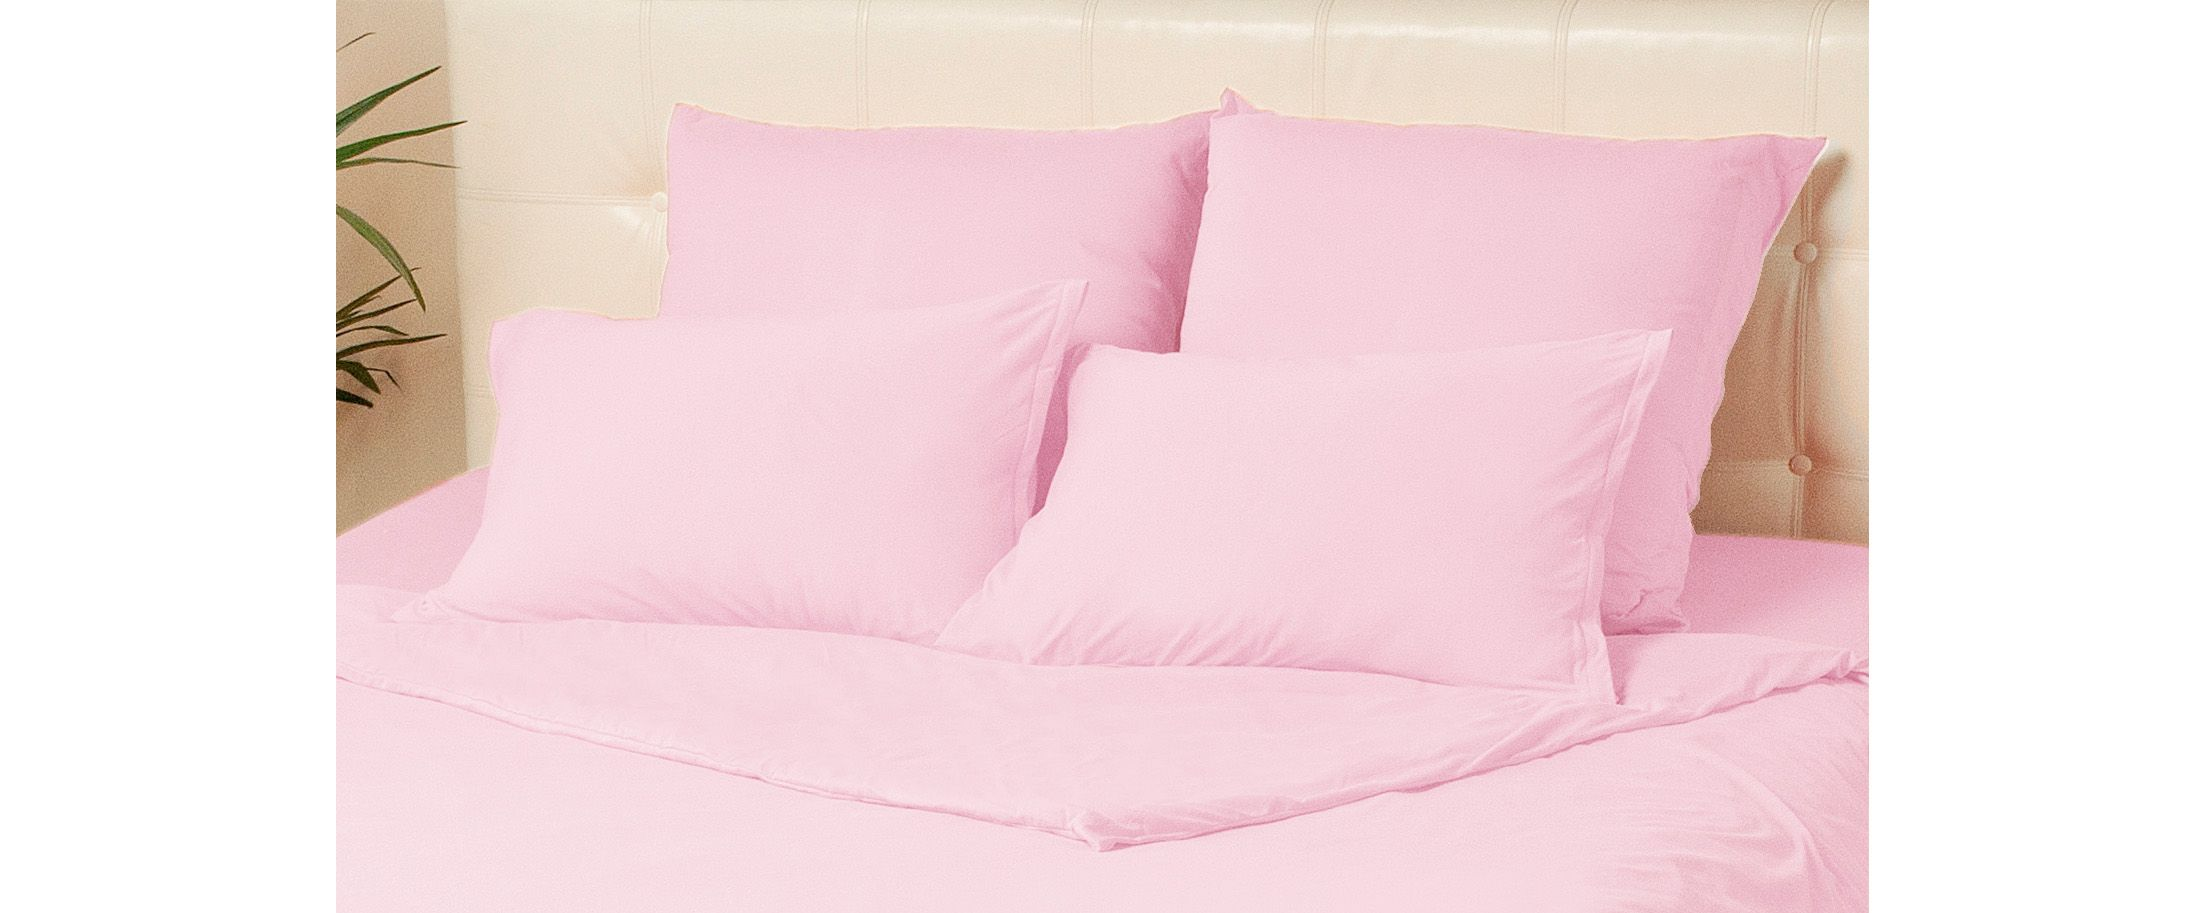 Комплект наволочек на молнии 50х70 розового цвета Violett Модель 4002Комплект наволочек на молнии 50х70 розового цвета Violett Модель 4002. Артикул К000704